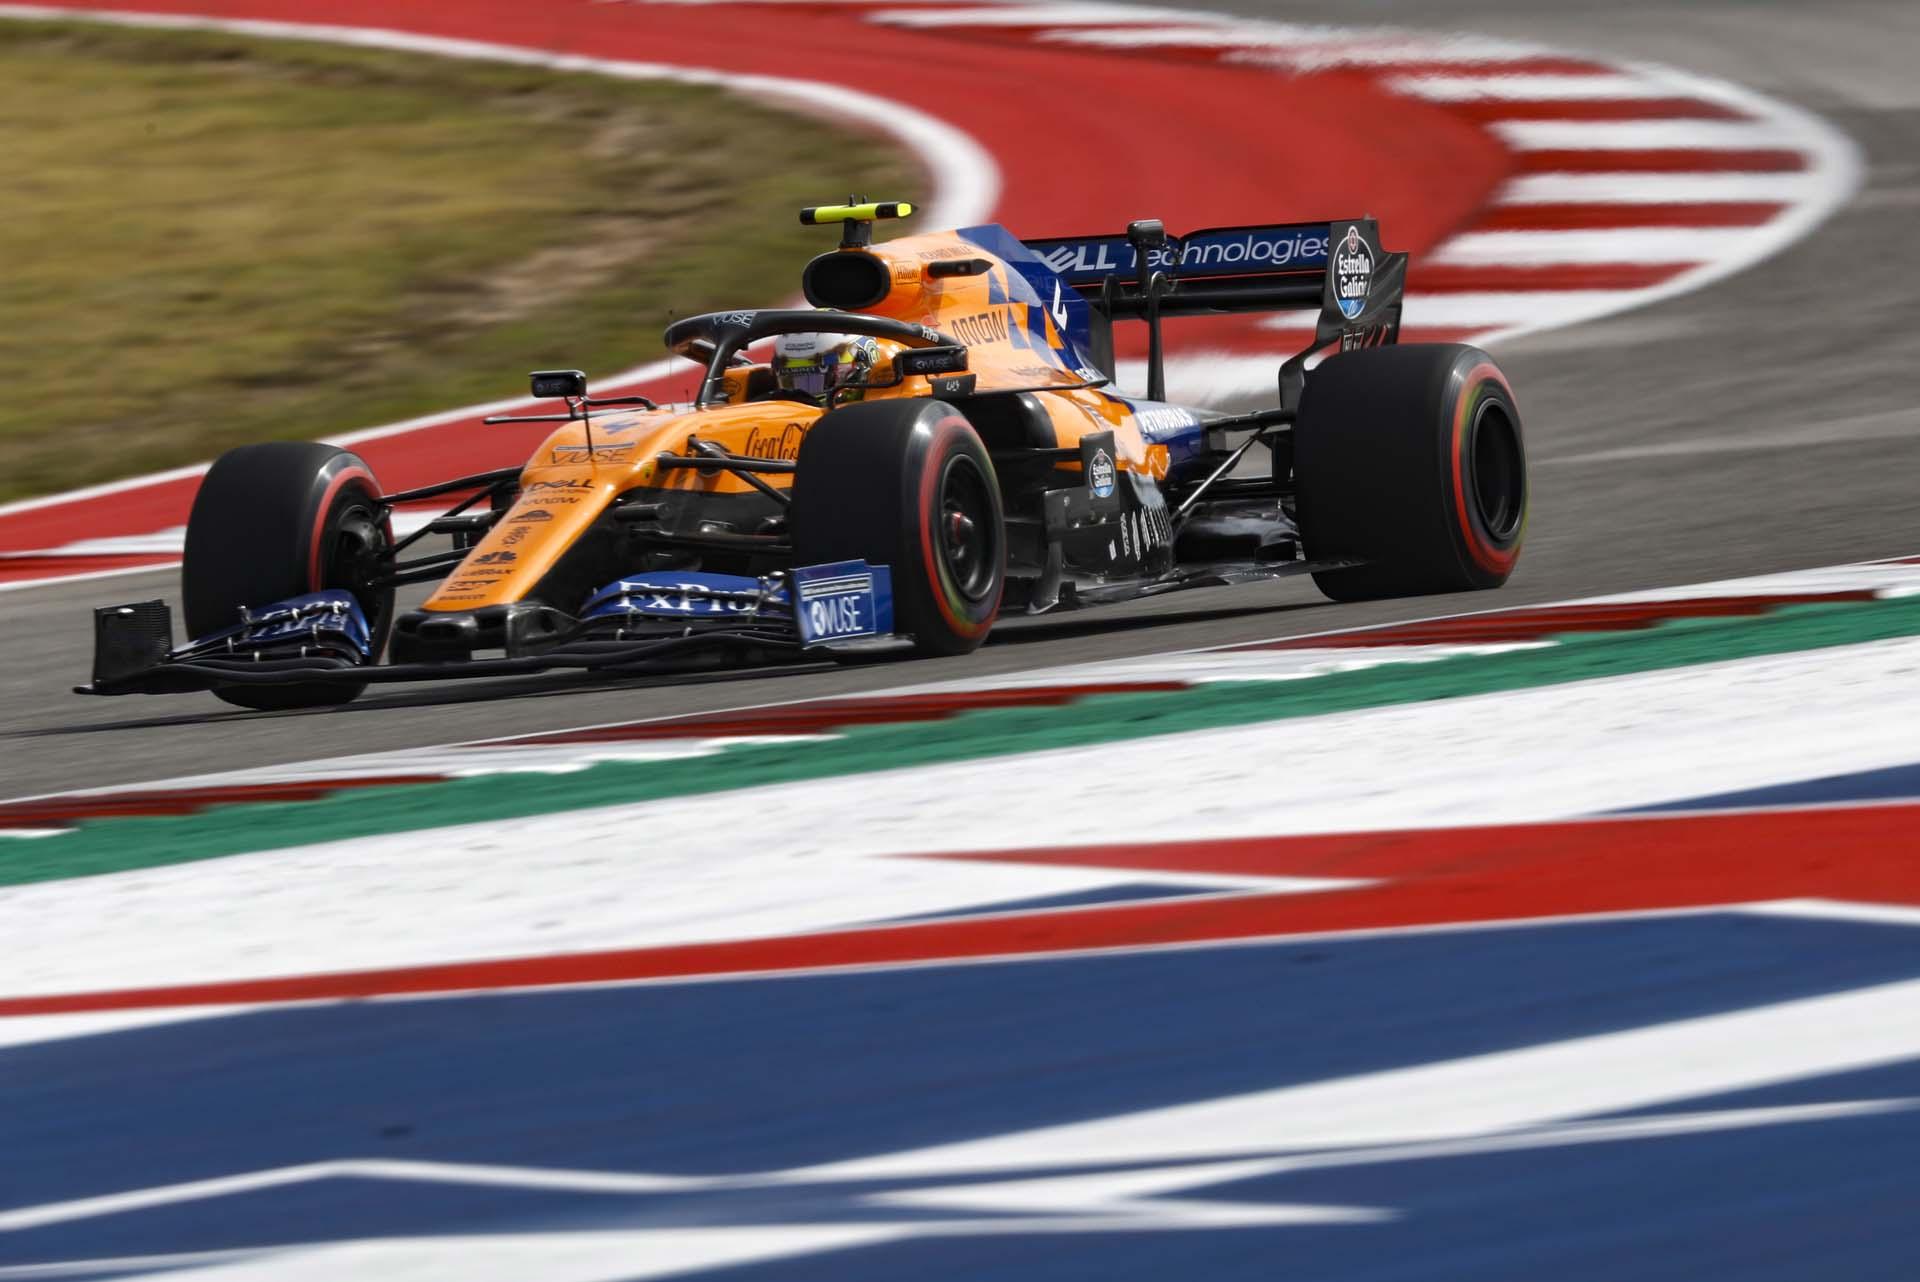 Lando Norris, McLaren MCL34 on a turn